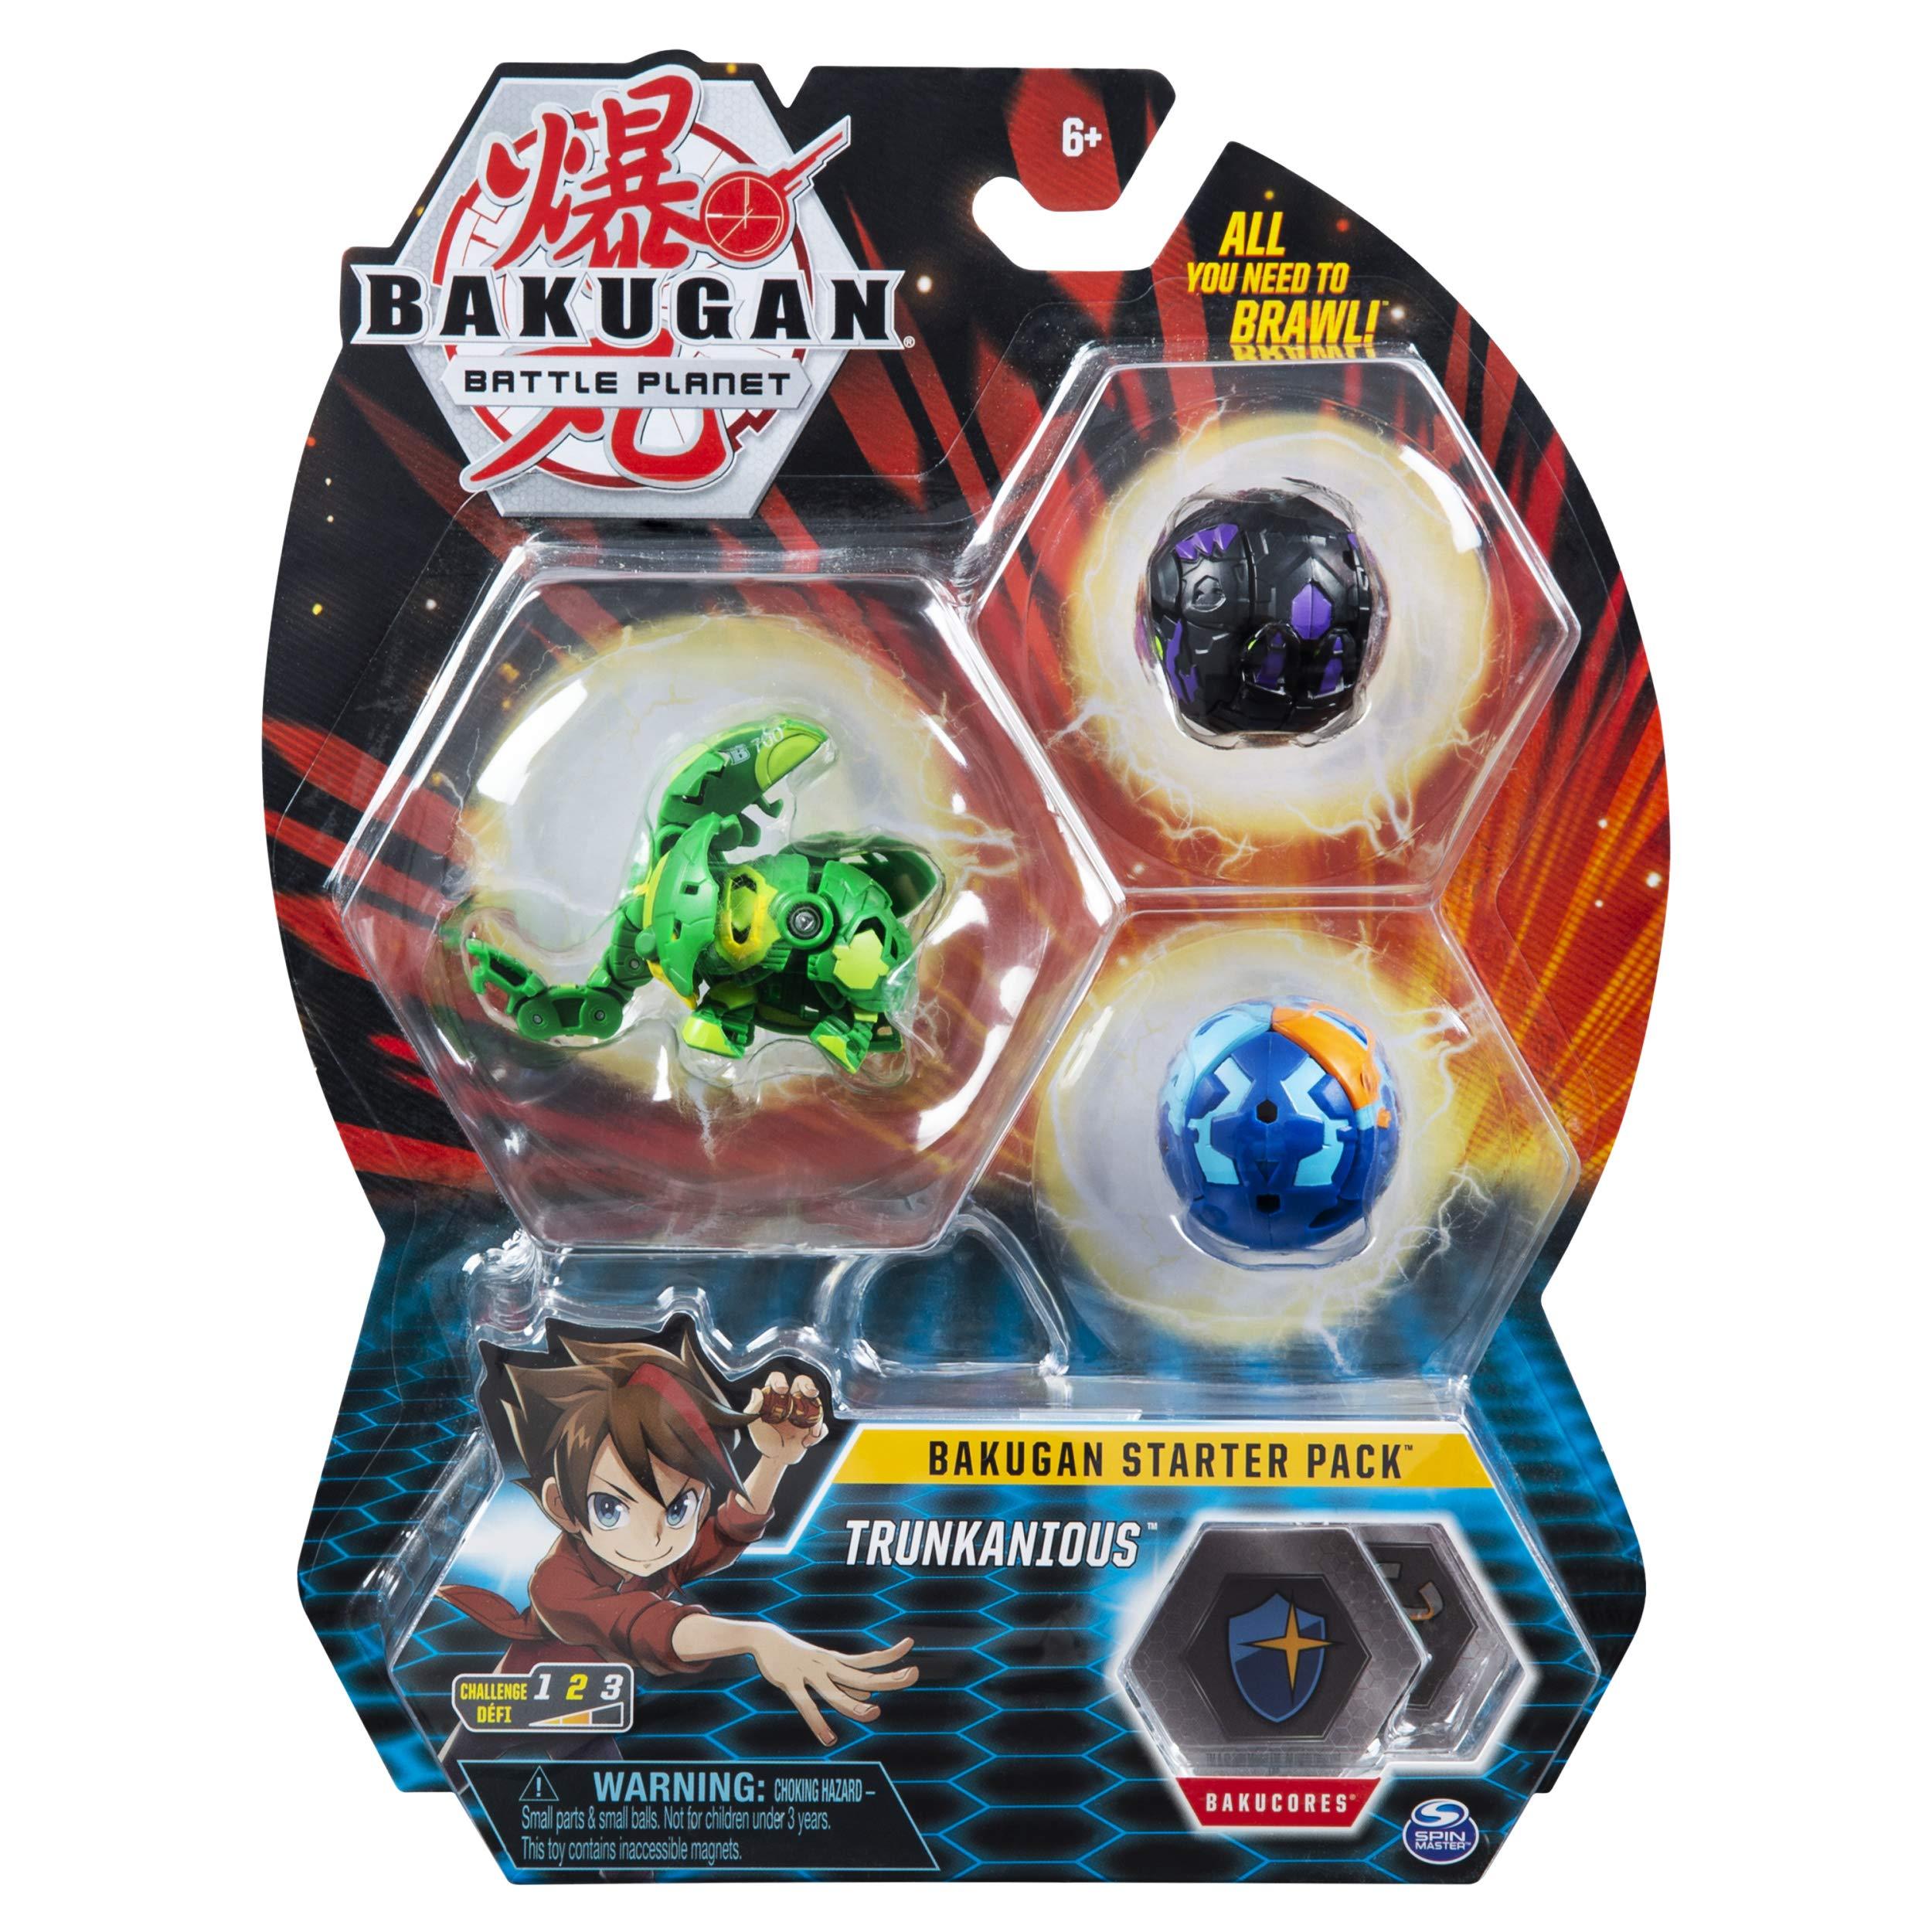 BKGAN Bakugan Starter Pack Trunkanious: Amazon.es: Juguetes y juegos